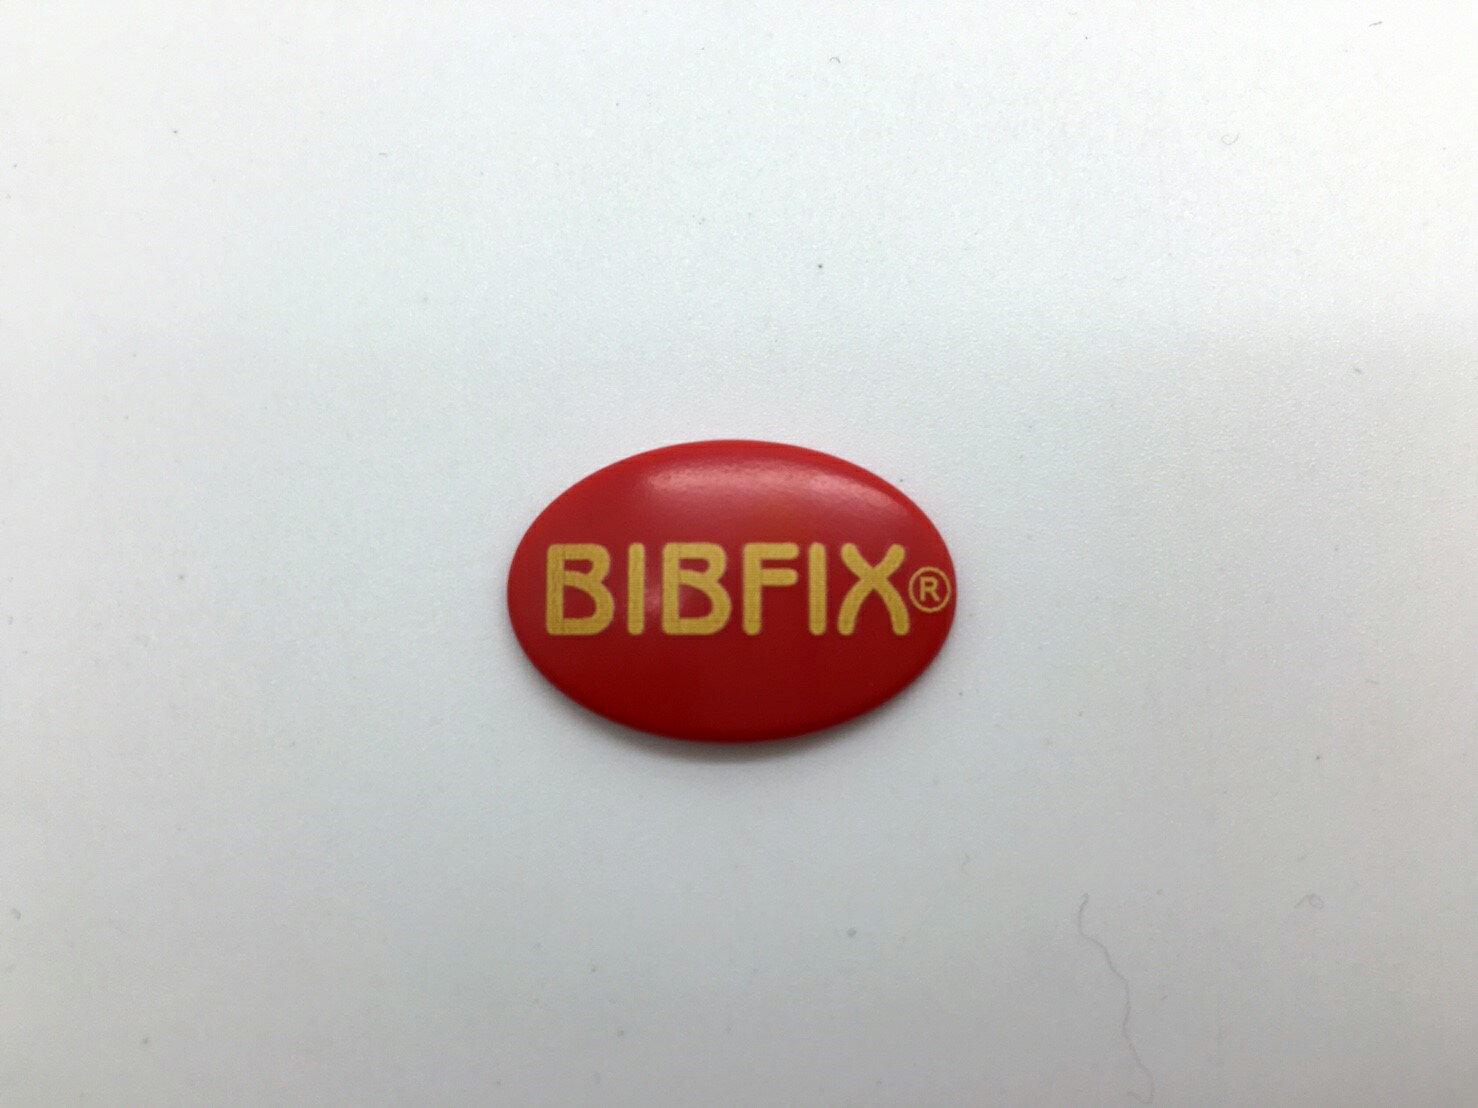 Bibfix號碼布塑膠扣 (紅底黃字)  附贈收納盒